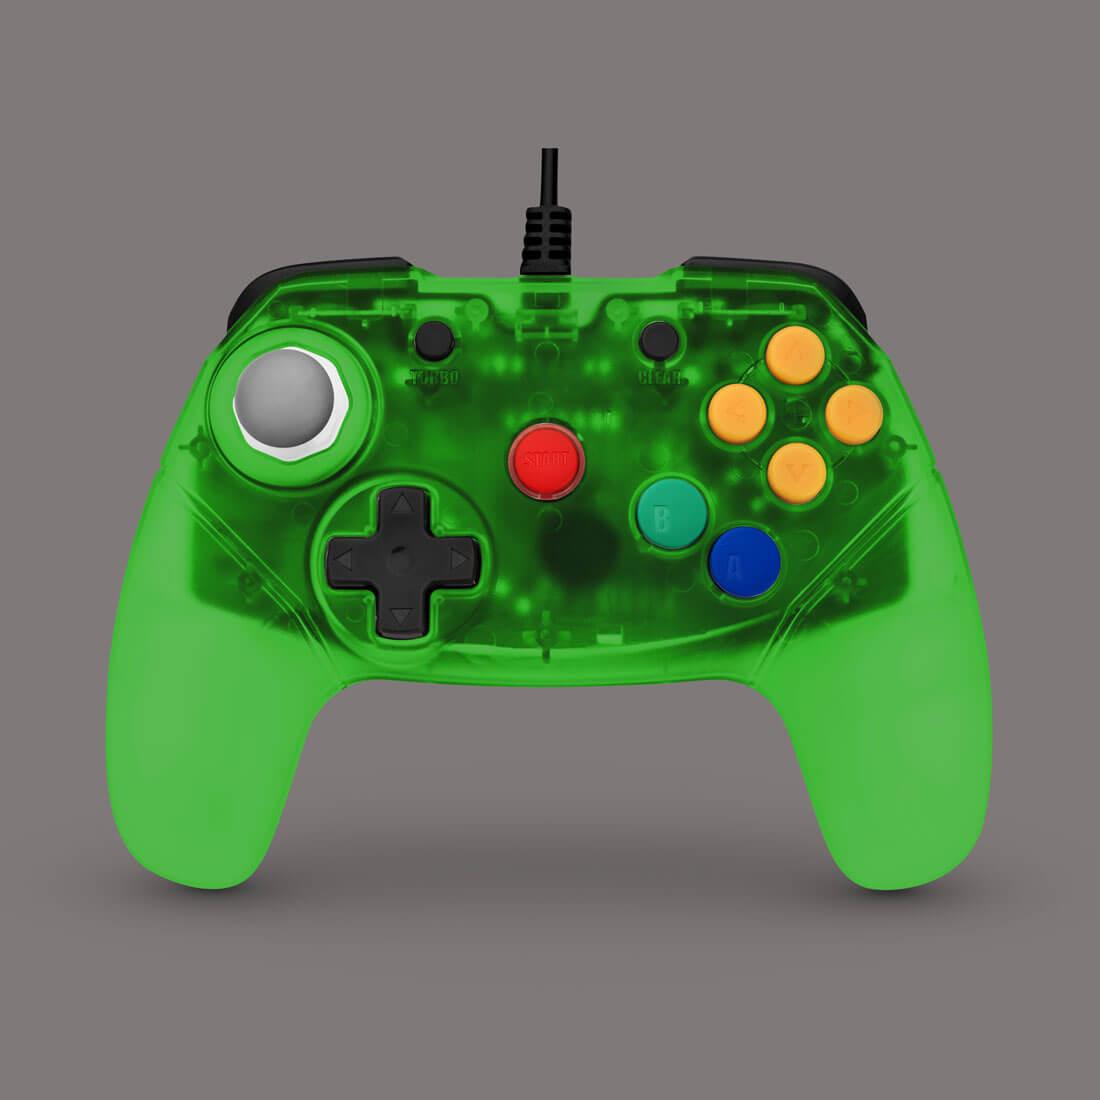 brawler64tc-front-green-1100x1100.jpg